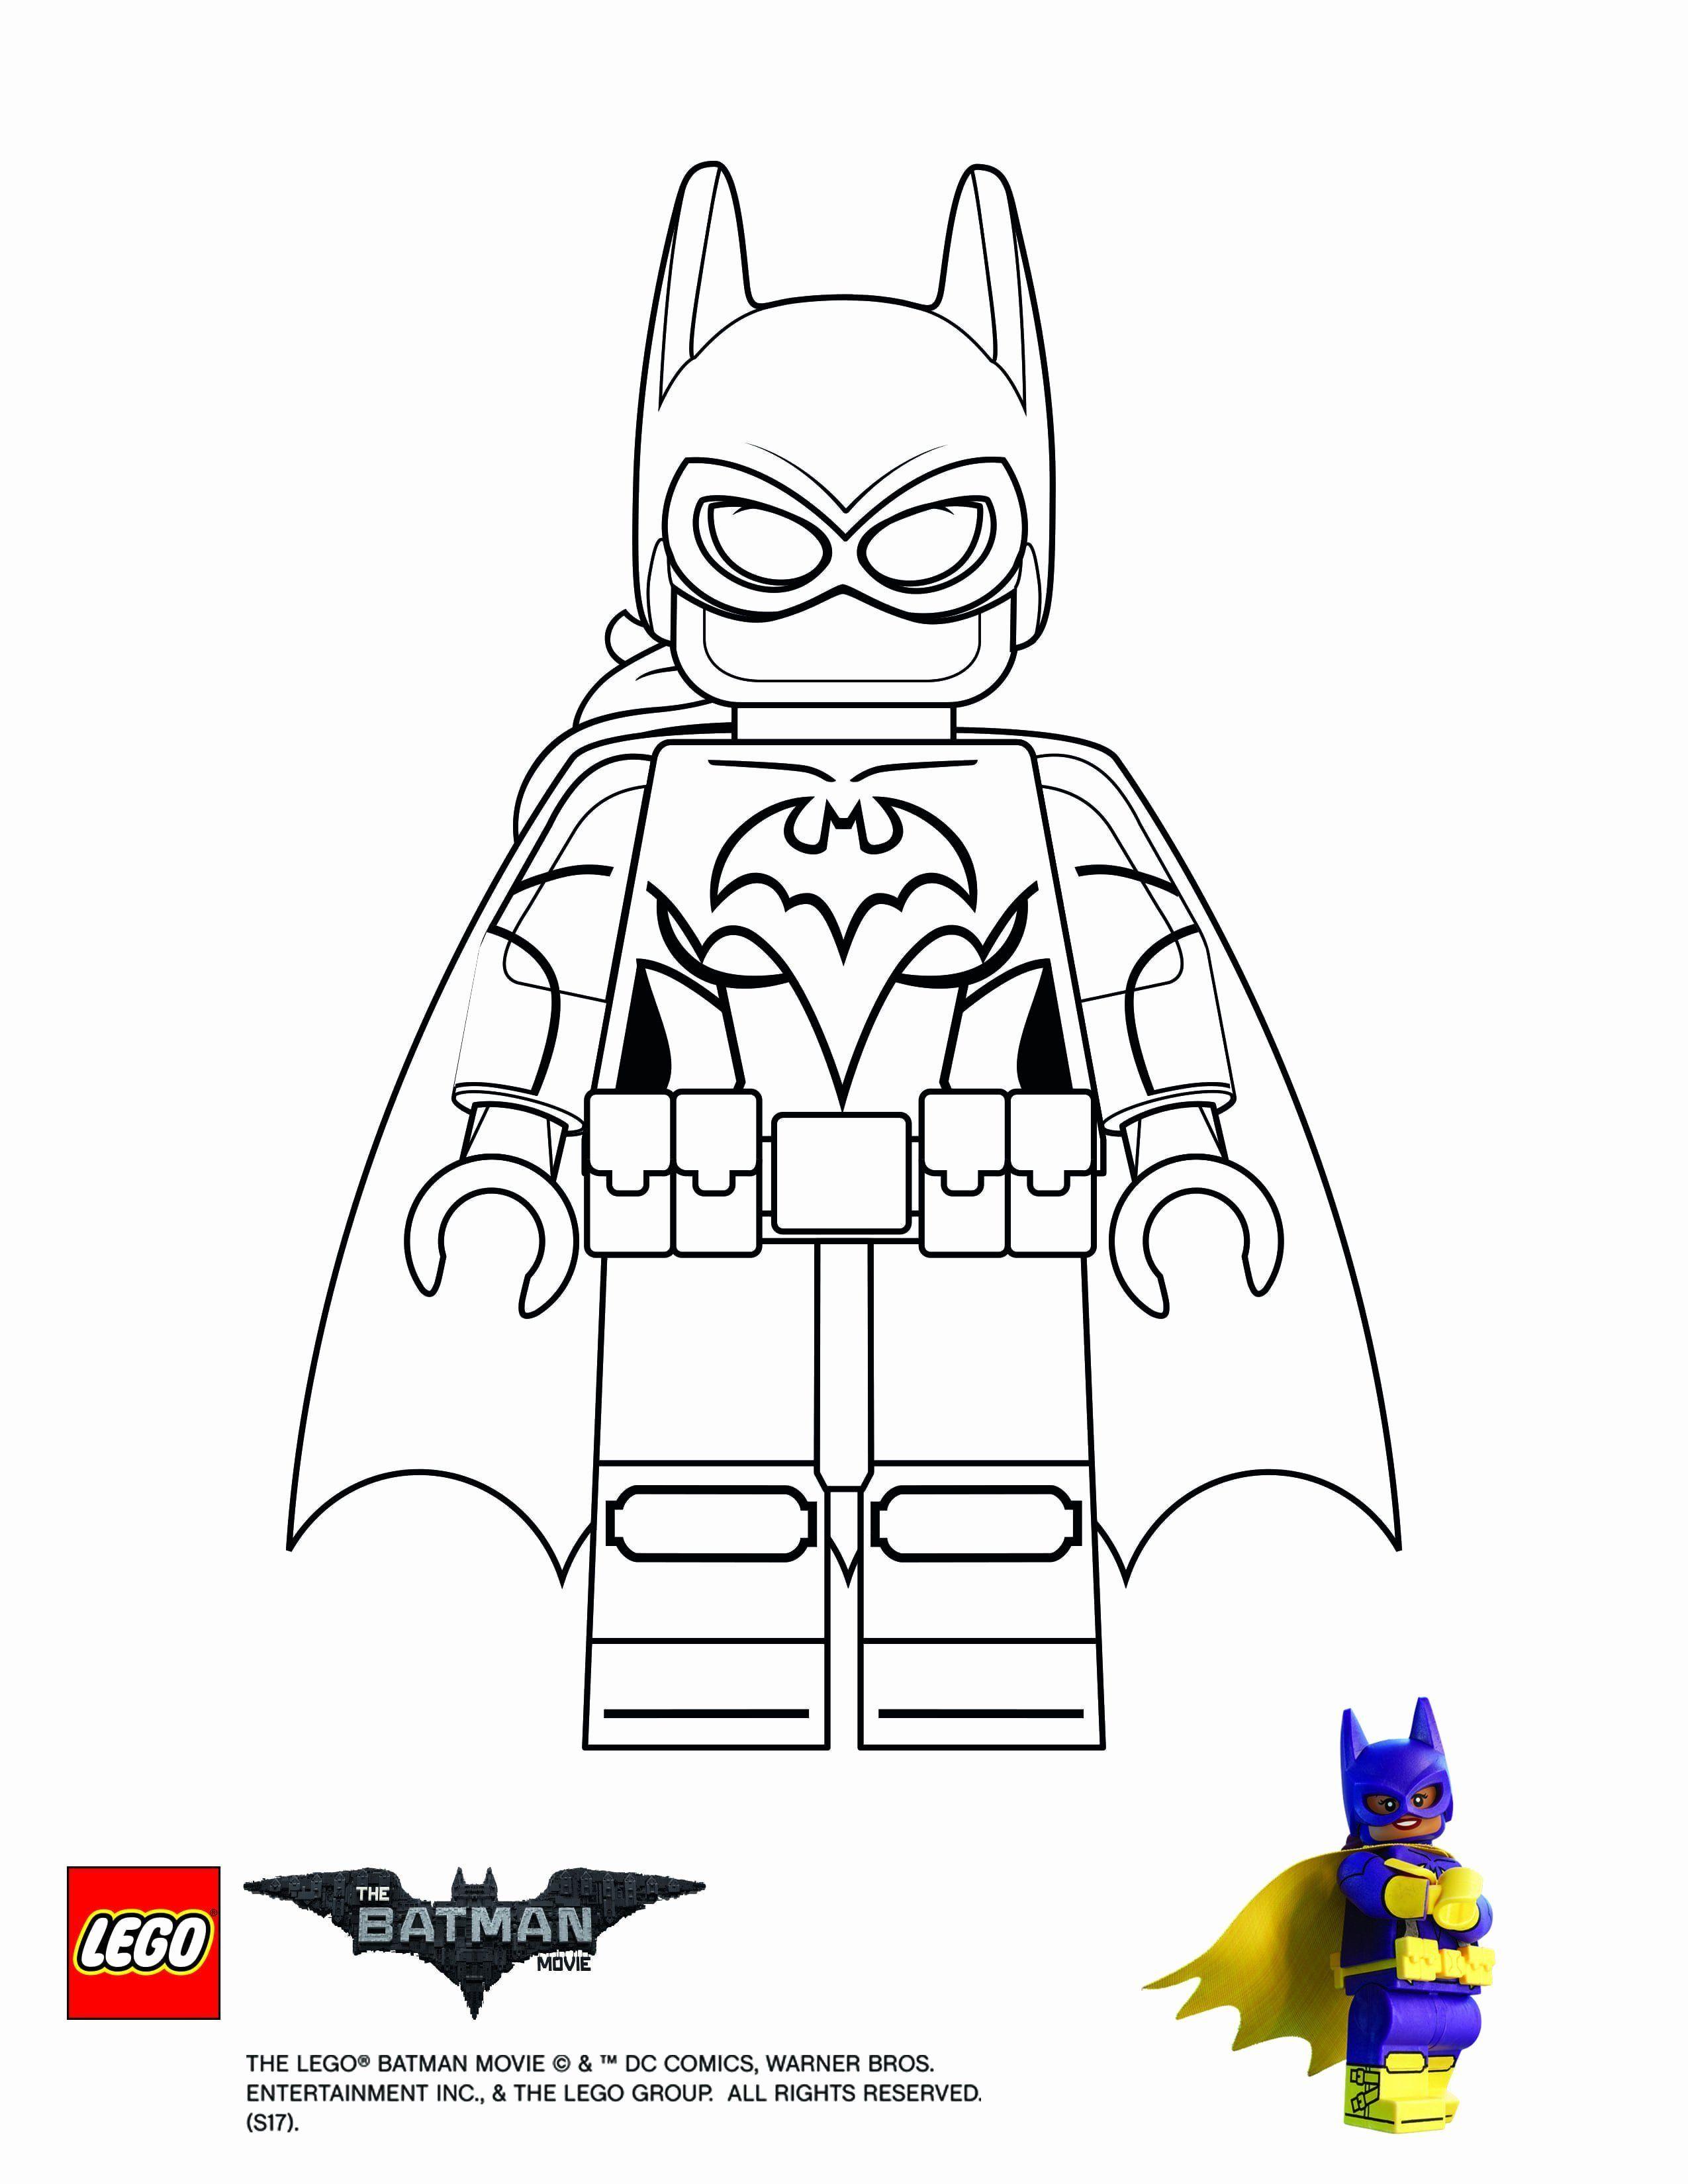 Cartoon Coloring Worksheets Best Of Lego Superhero Coloring Pages Best Lego Superman Coloring In 2020 Lego Coloring Pages Lego Coloring Lego Batman Birthday